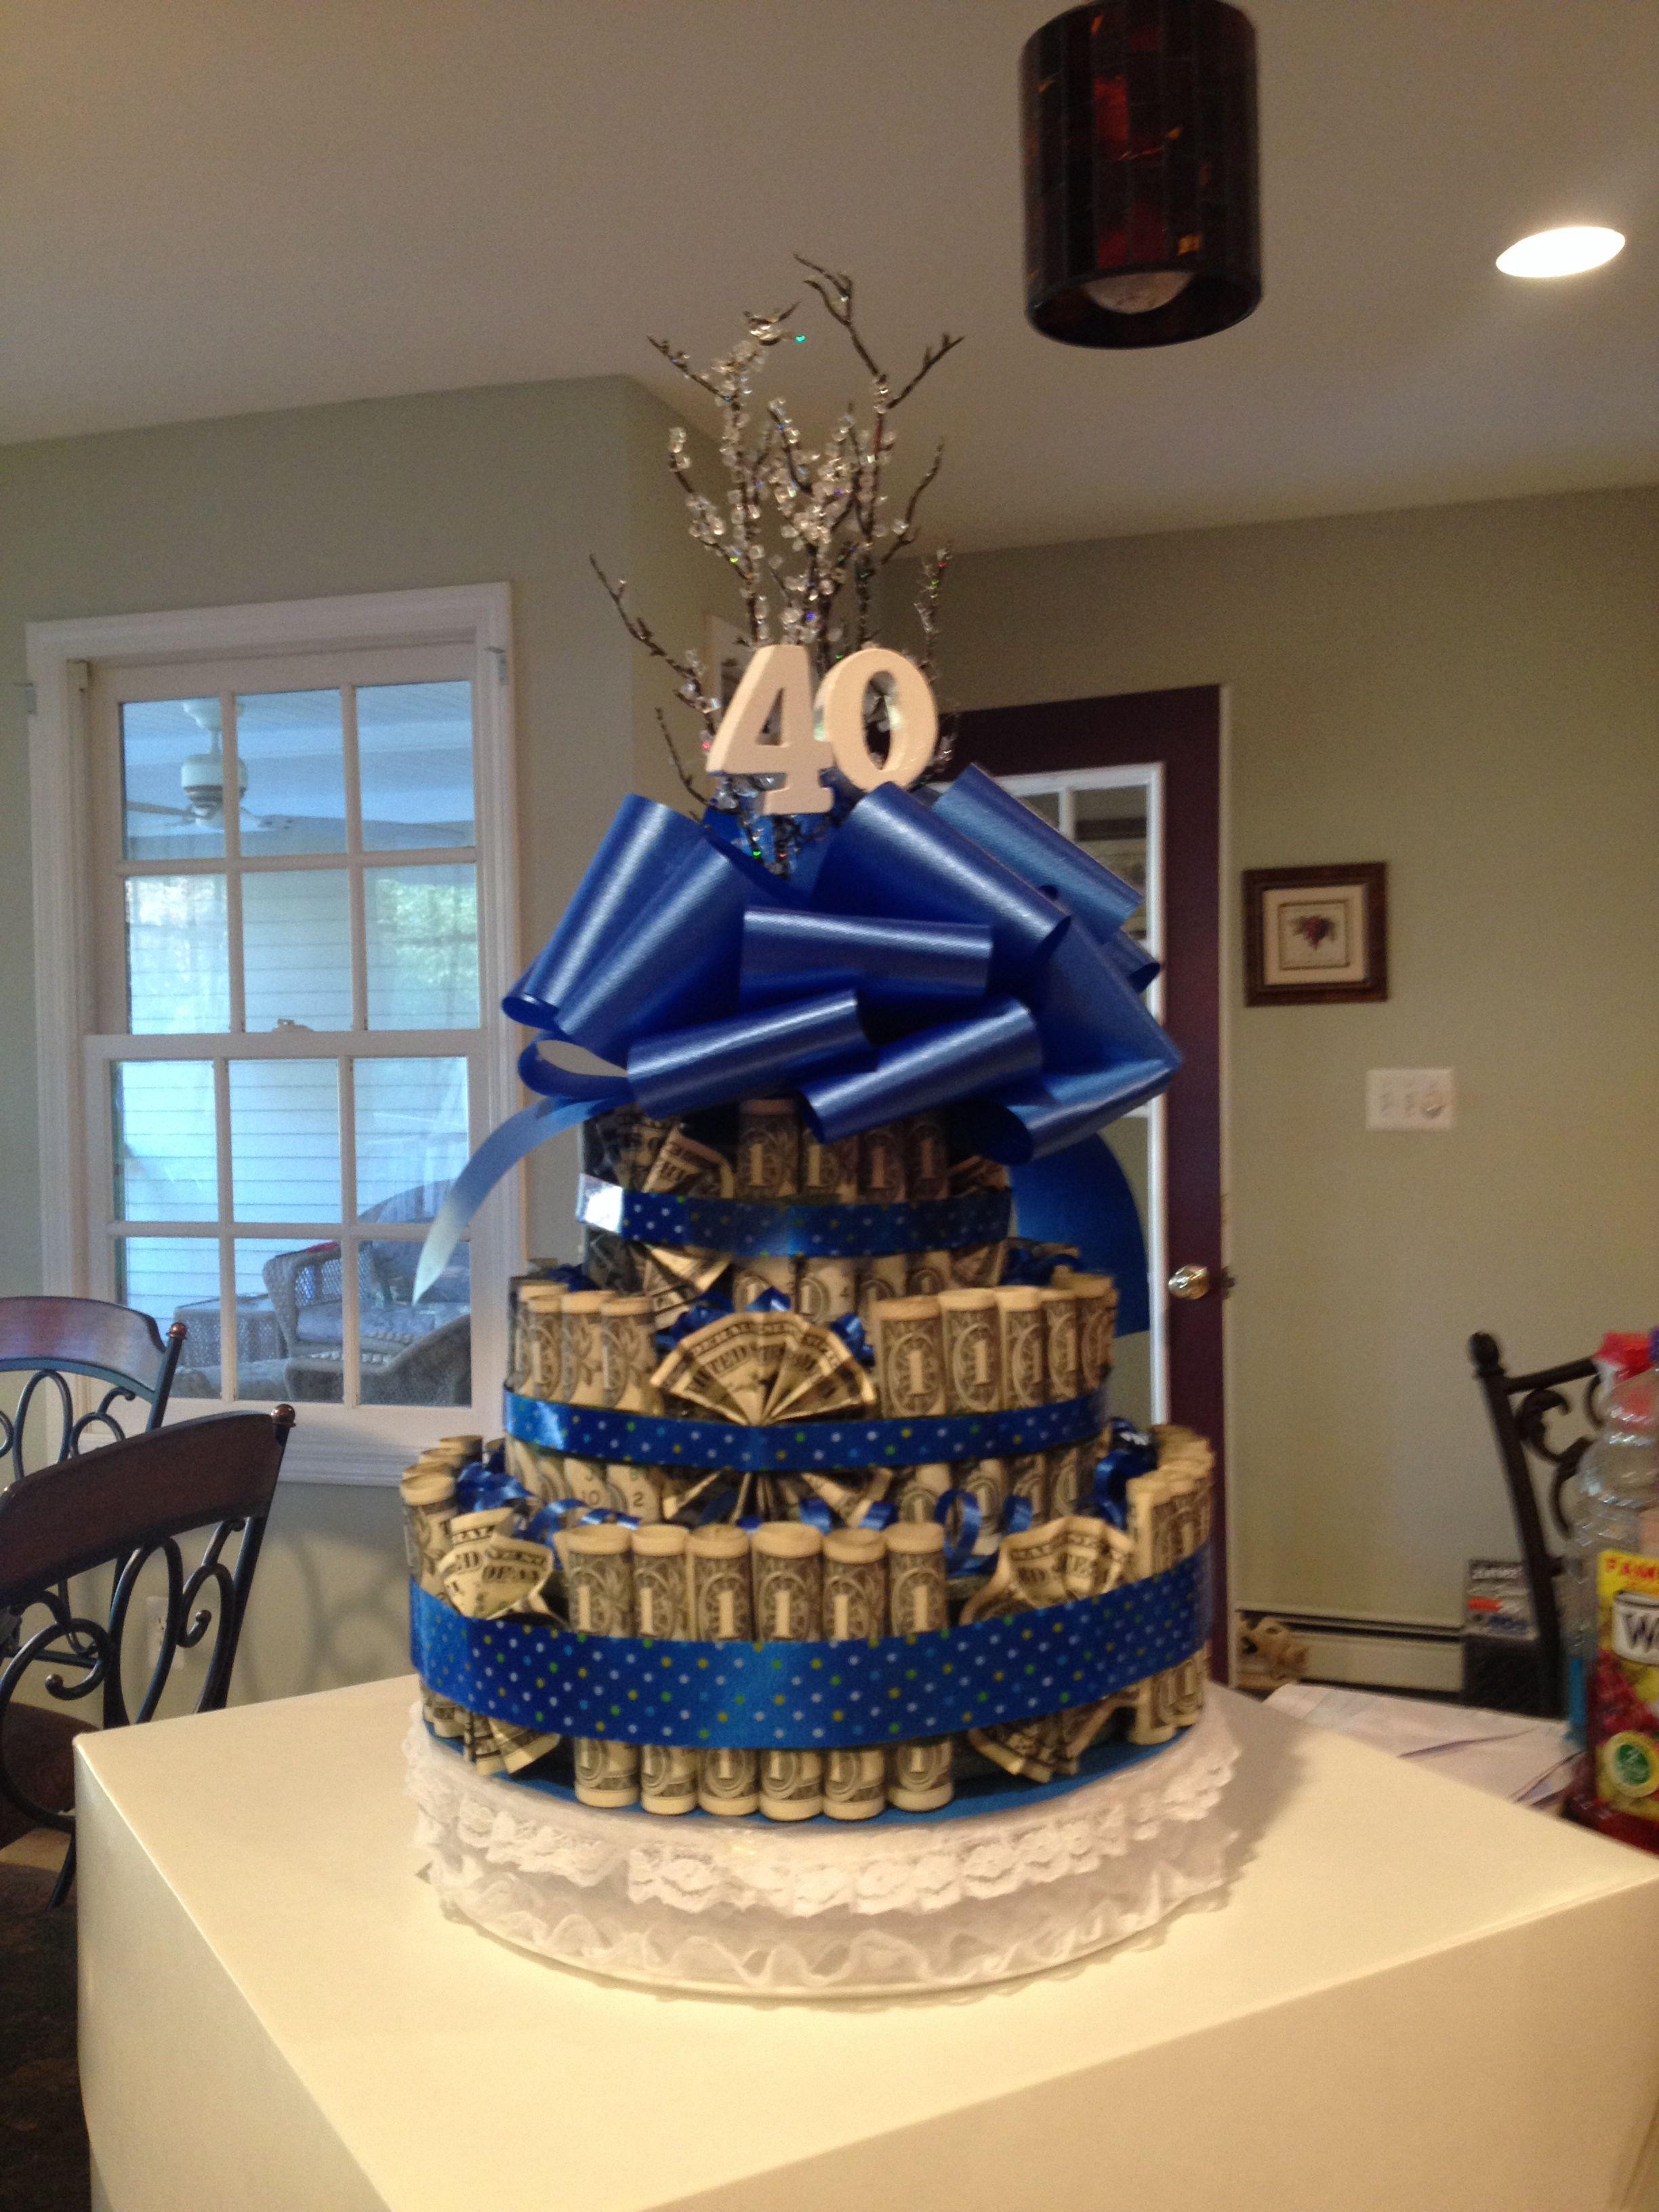 Diy Birthday Money Cake Diy Arts And Crafts